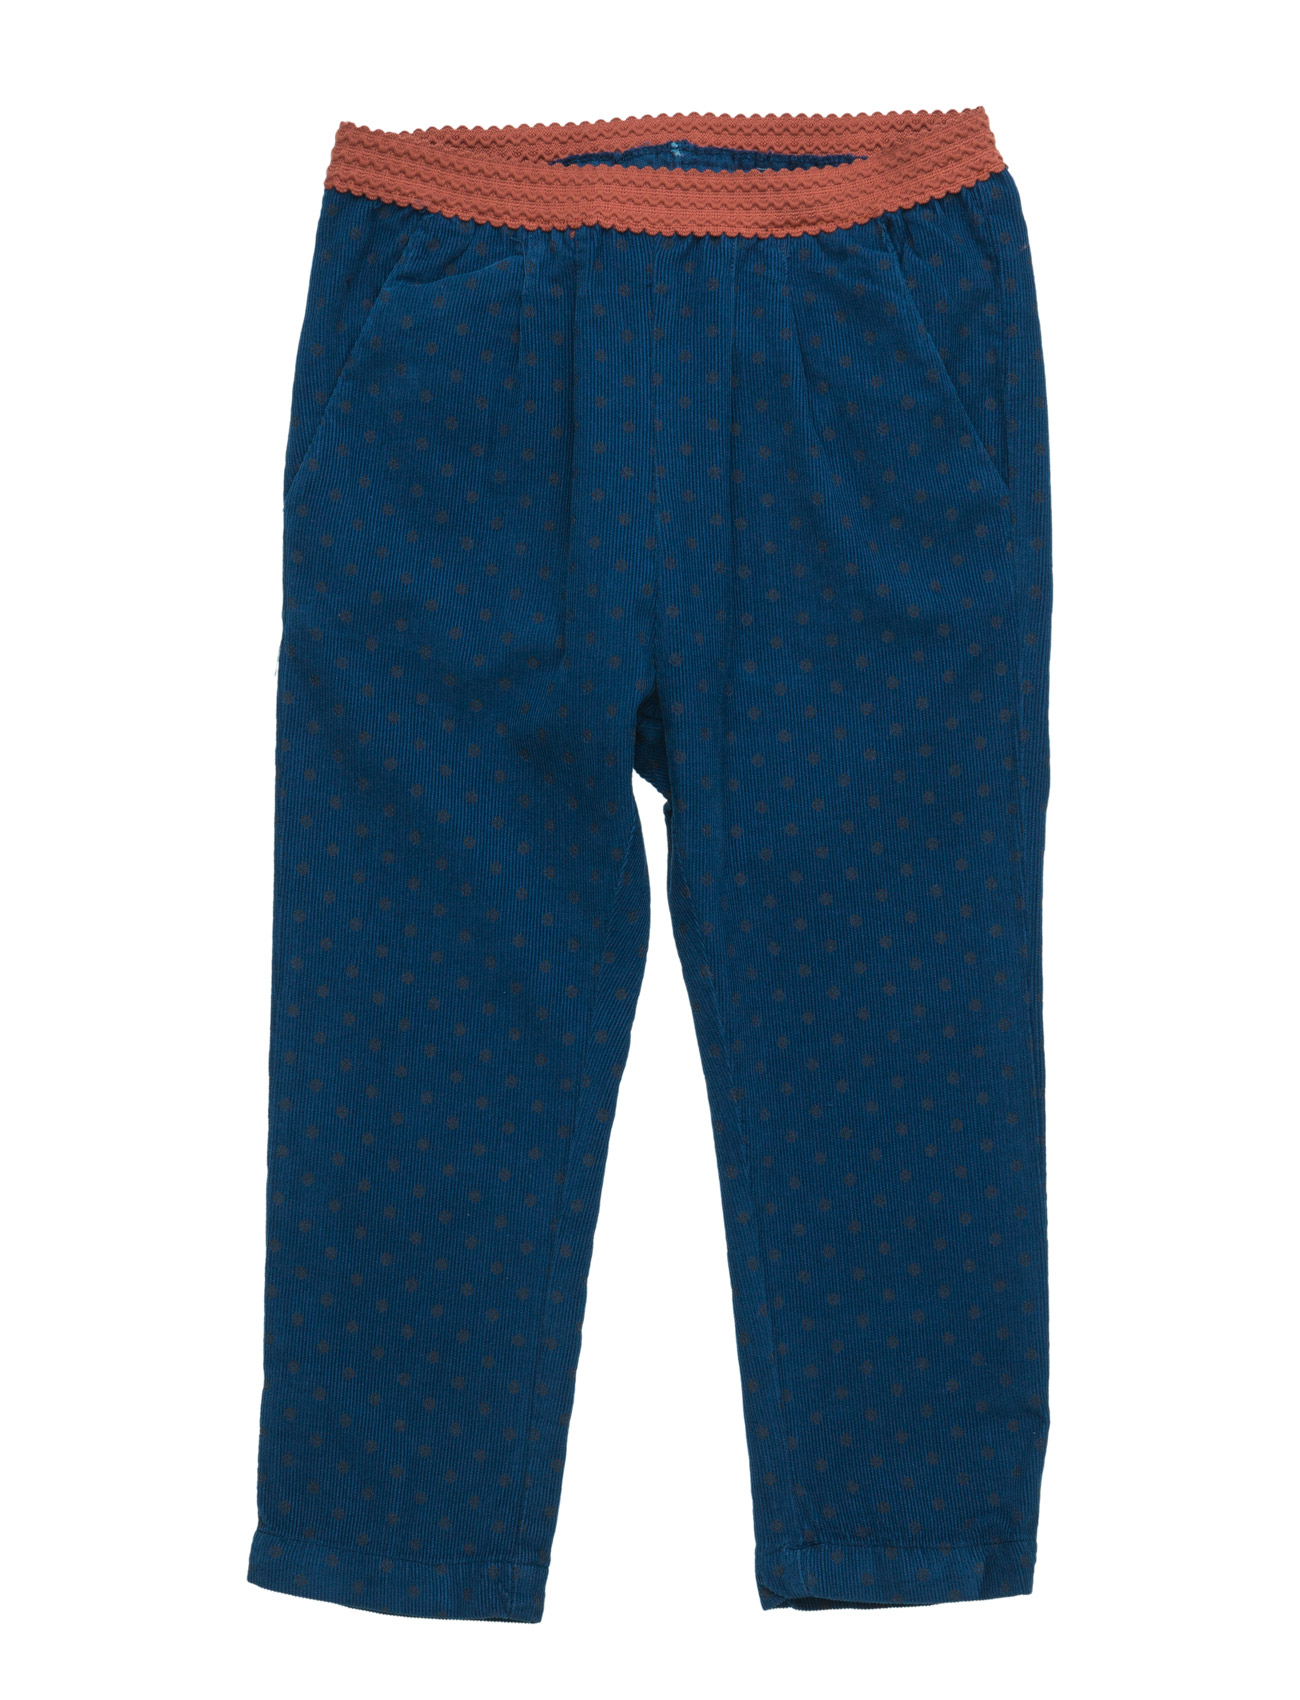 Printed Corduroy Trousers Mango Kids  til Børn i Navy blå